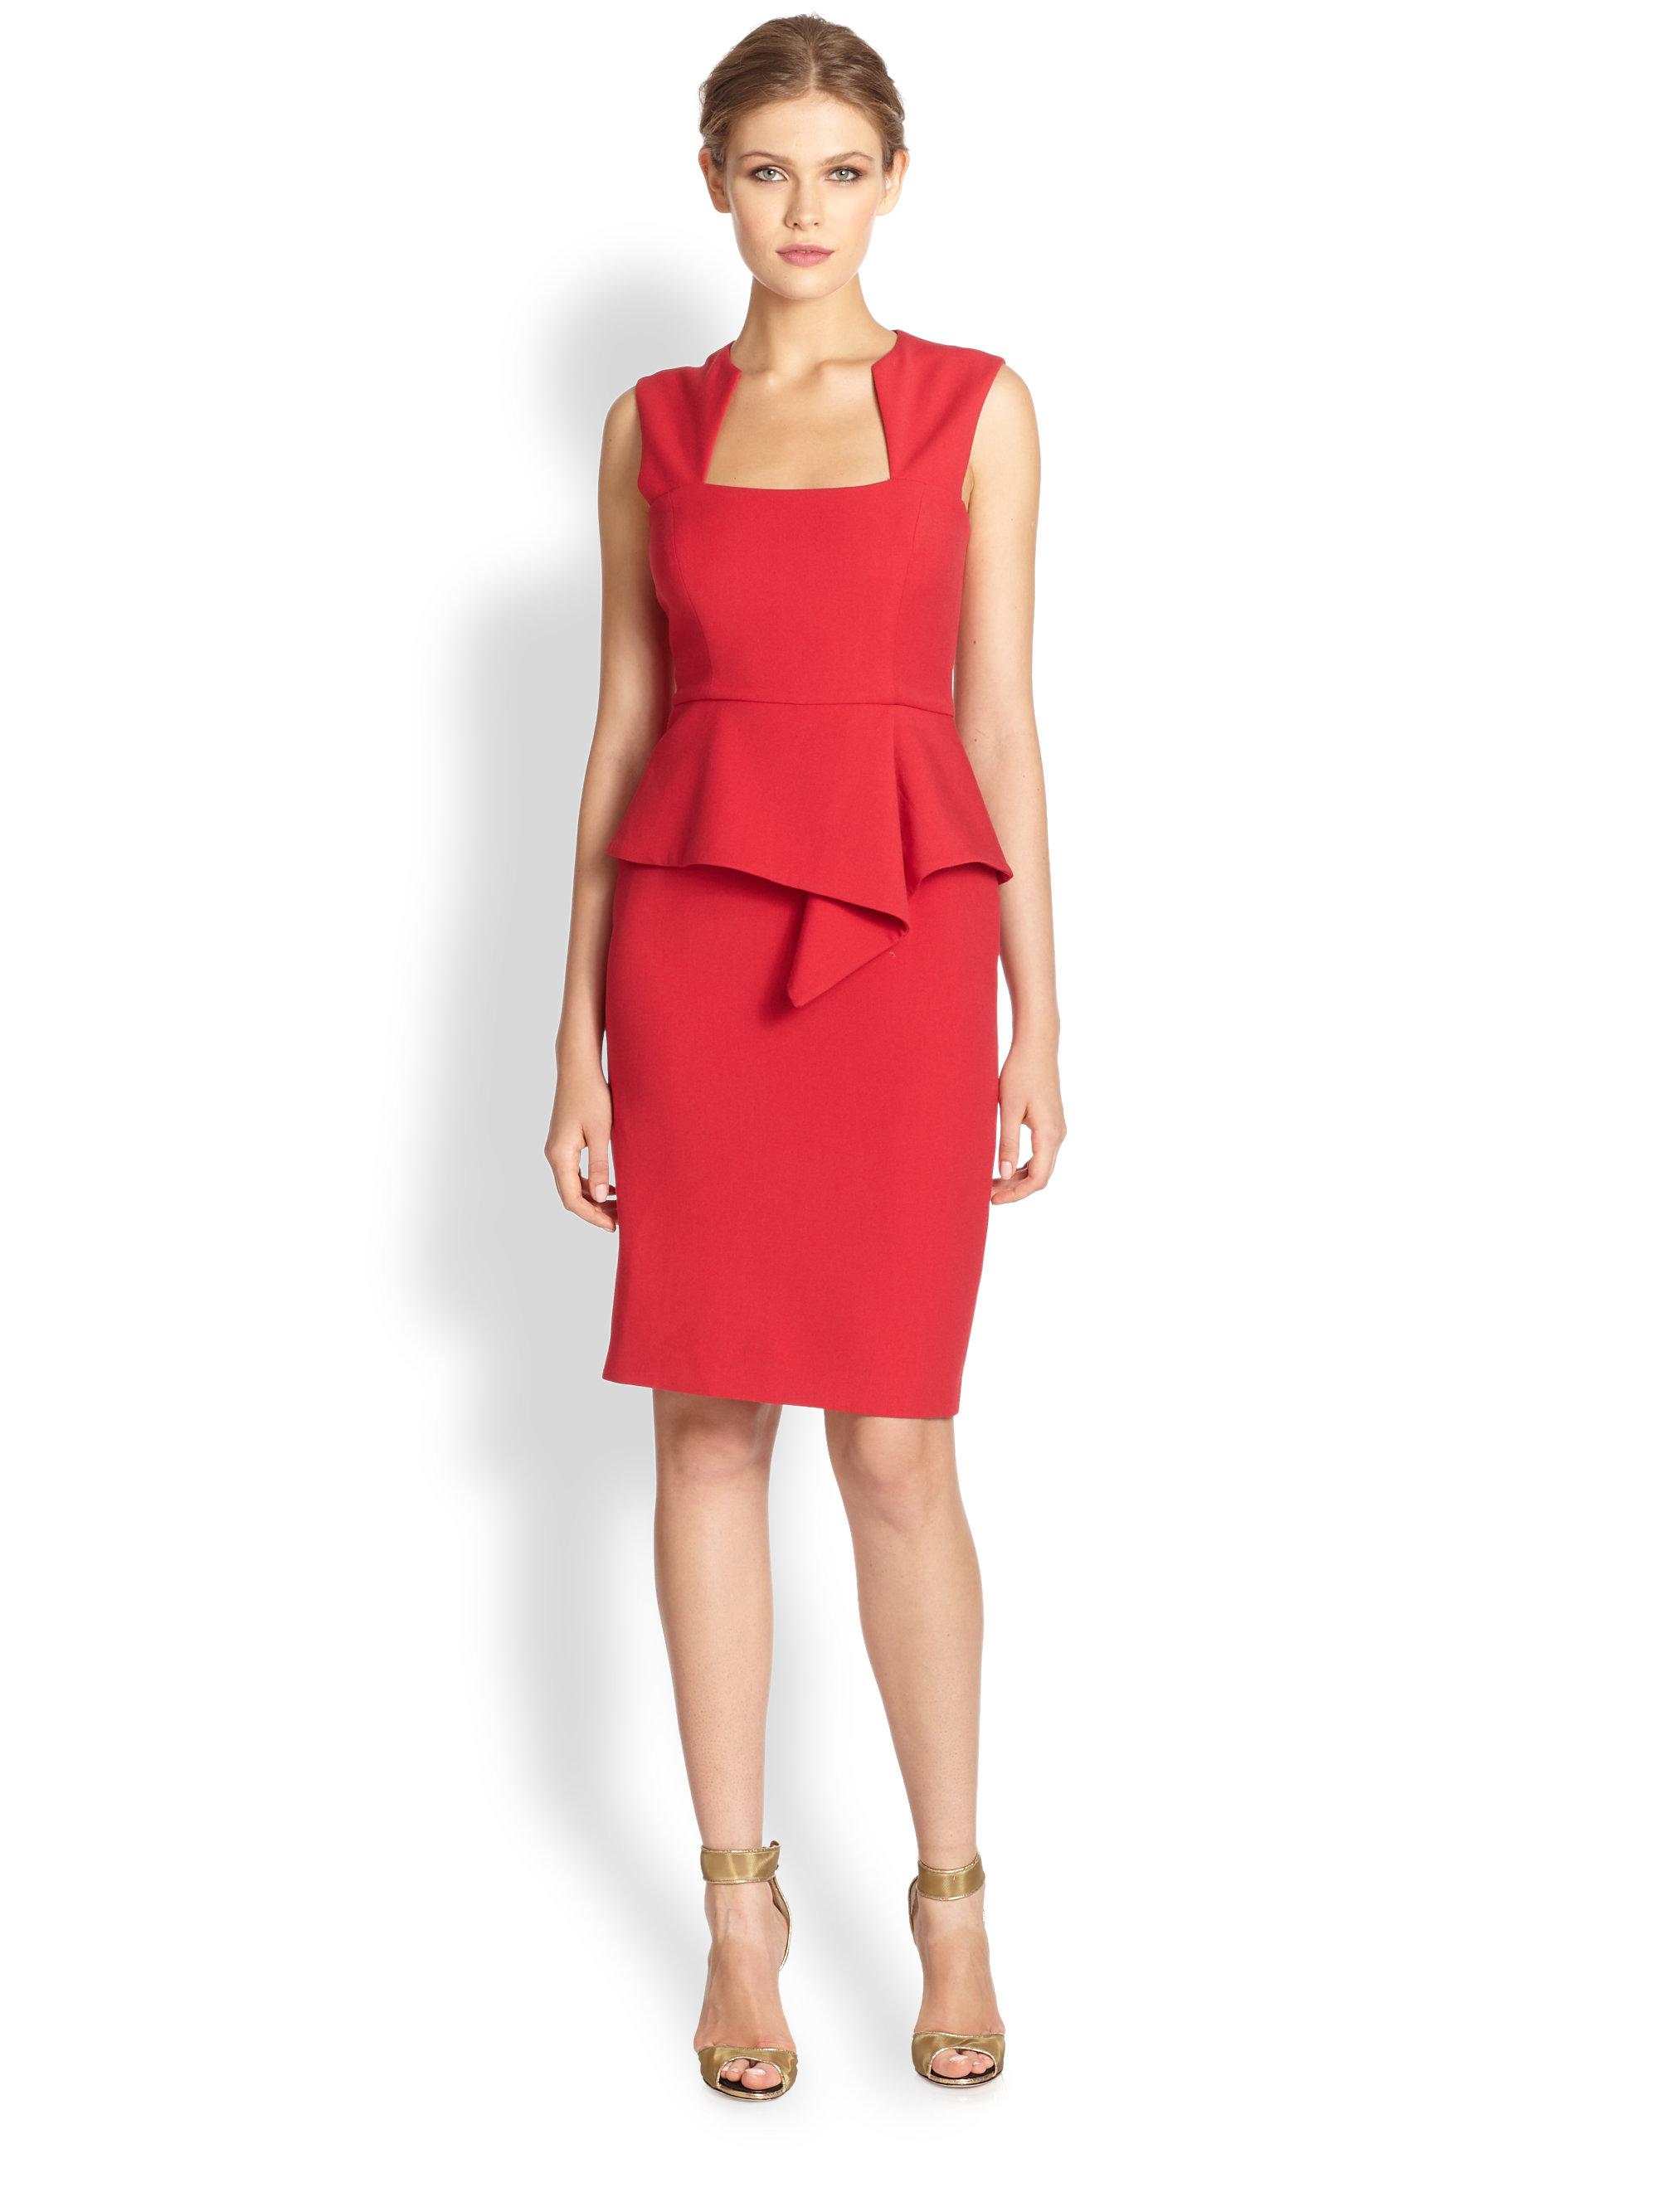 Lyst - Bcbgmaxazria Simone Peplum Dress in Red